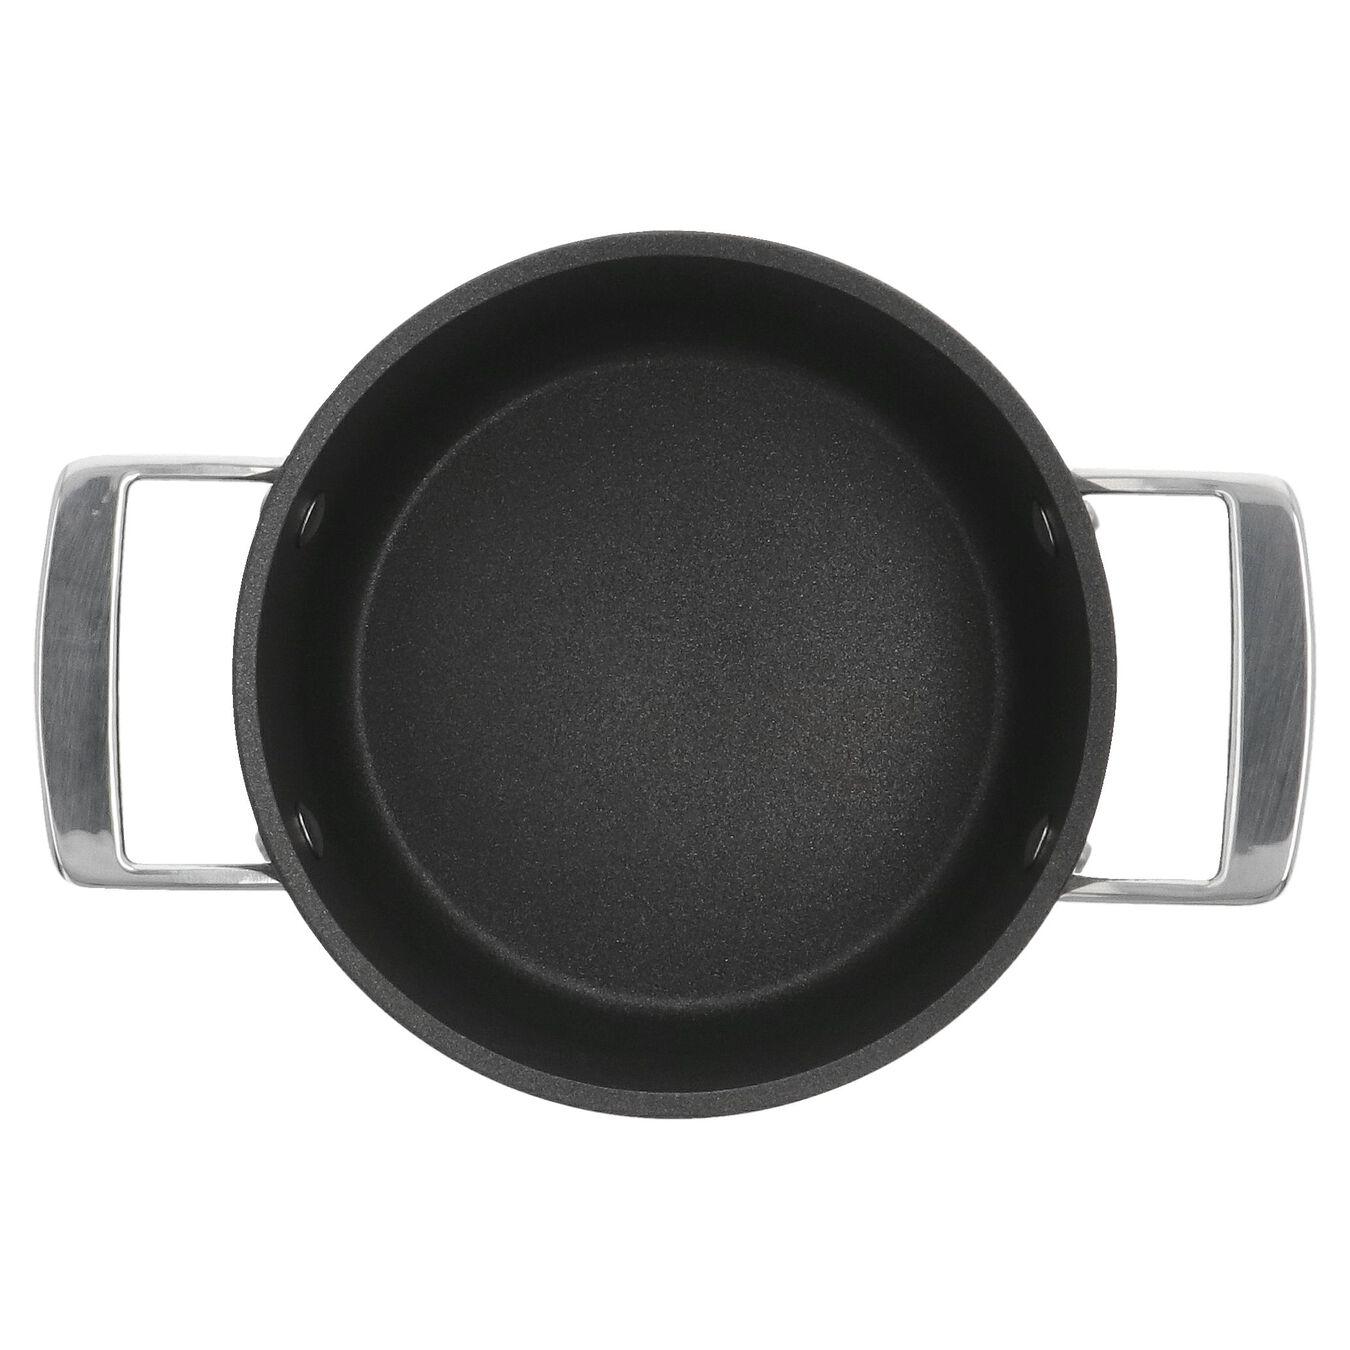 Kookpot met deksel Duraslide Titanium 16 cm / 1,5 l,,large 5